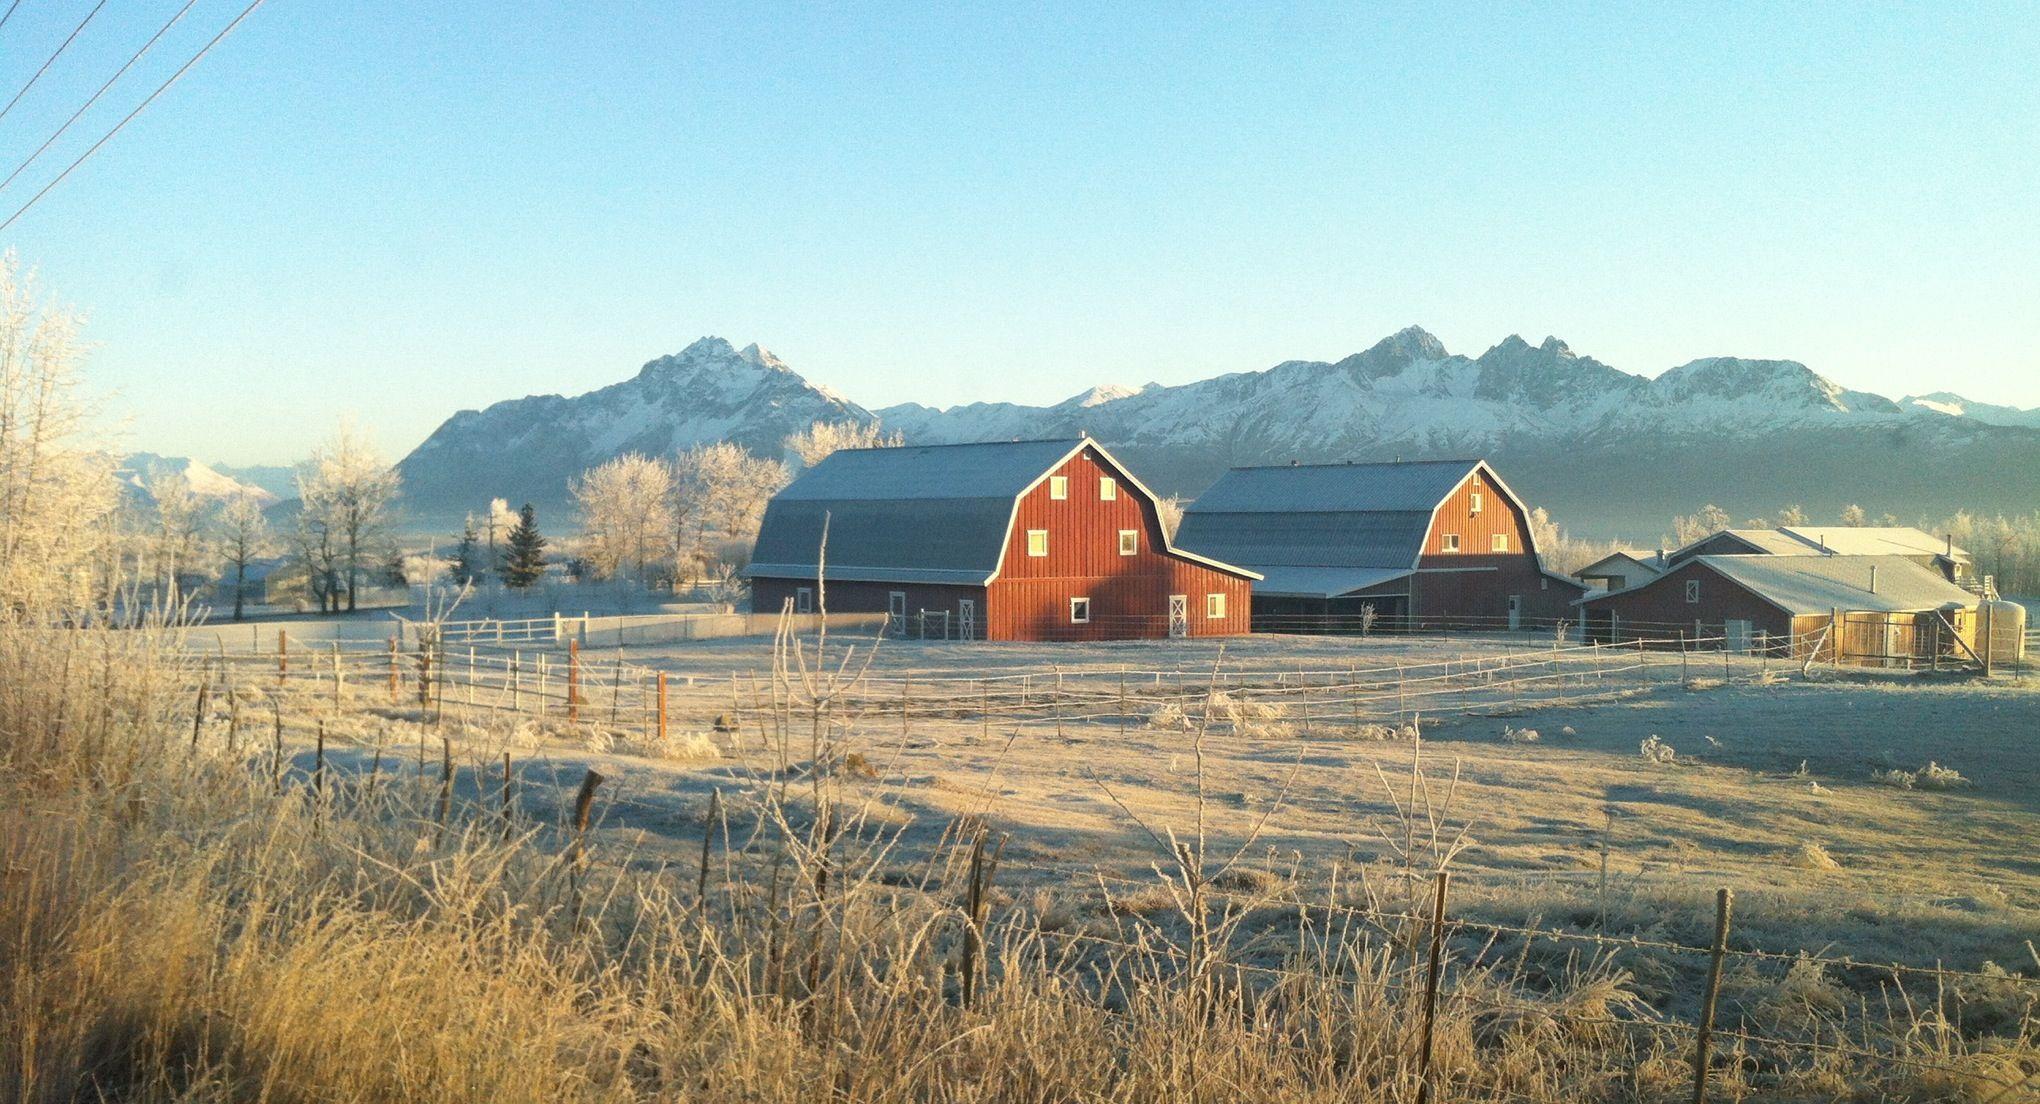 Wasilla, AK Matanuska Susitna Country Land 0.540000 acre ... |Wasilla Alaska Landscape